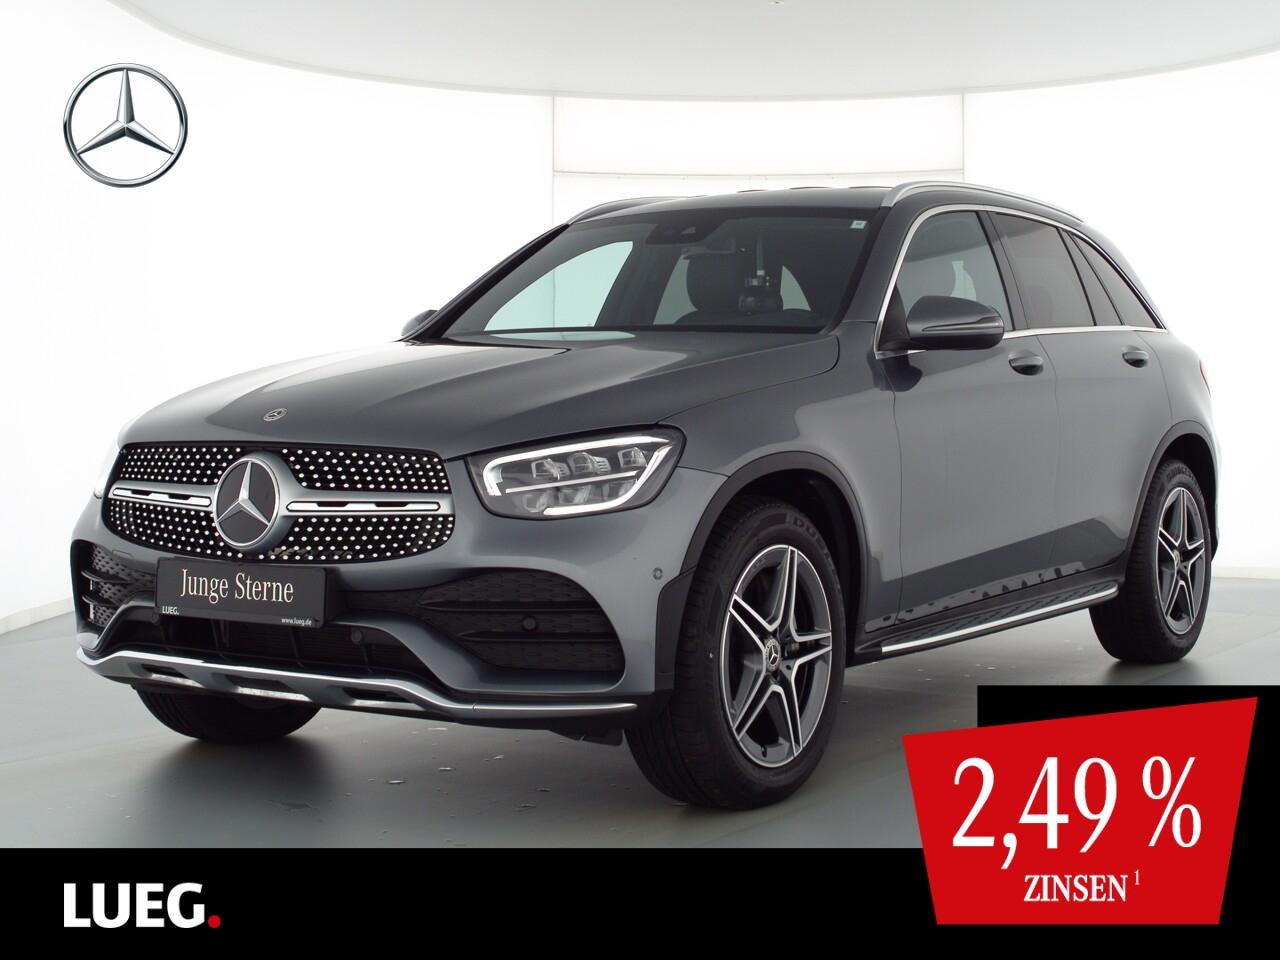 Mercedes-Benz GLC 200 d 4M AMG+MBUX+LED-HP+SpurPk+EHeck+Kamera, Jahr 2020, Diesel